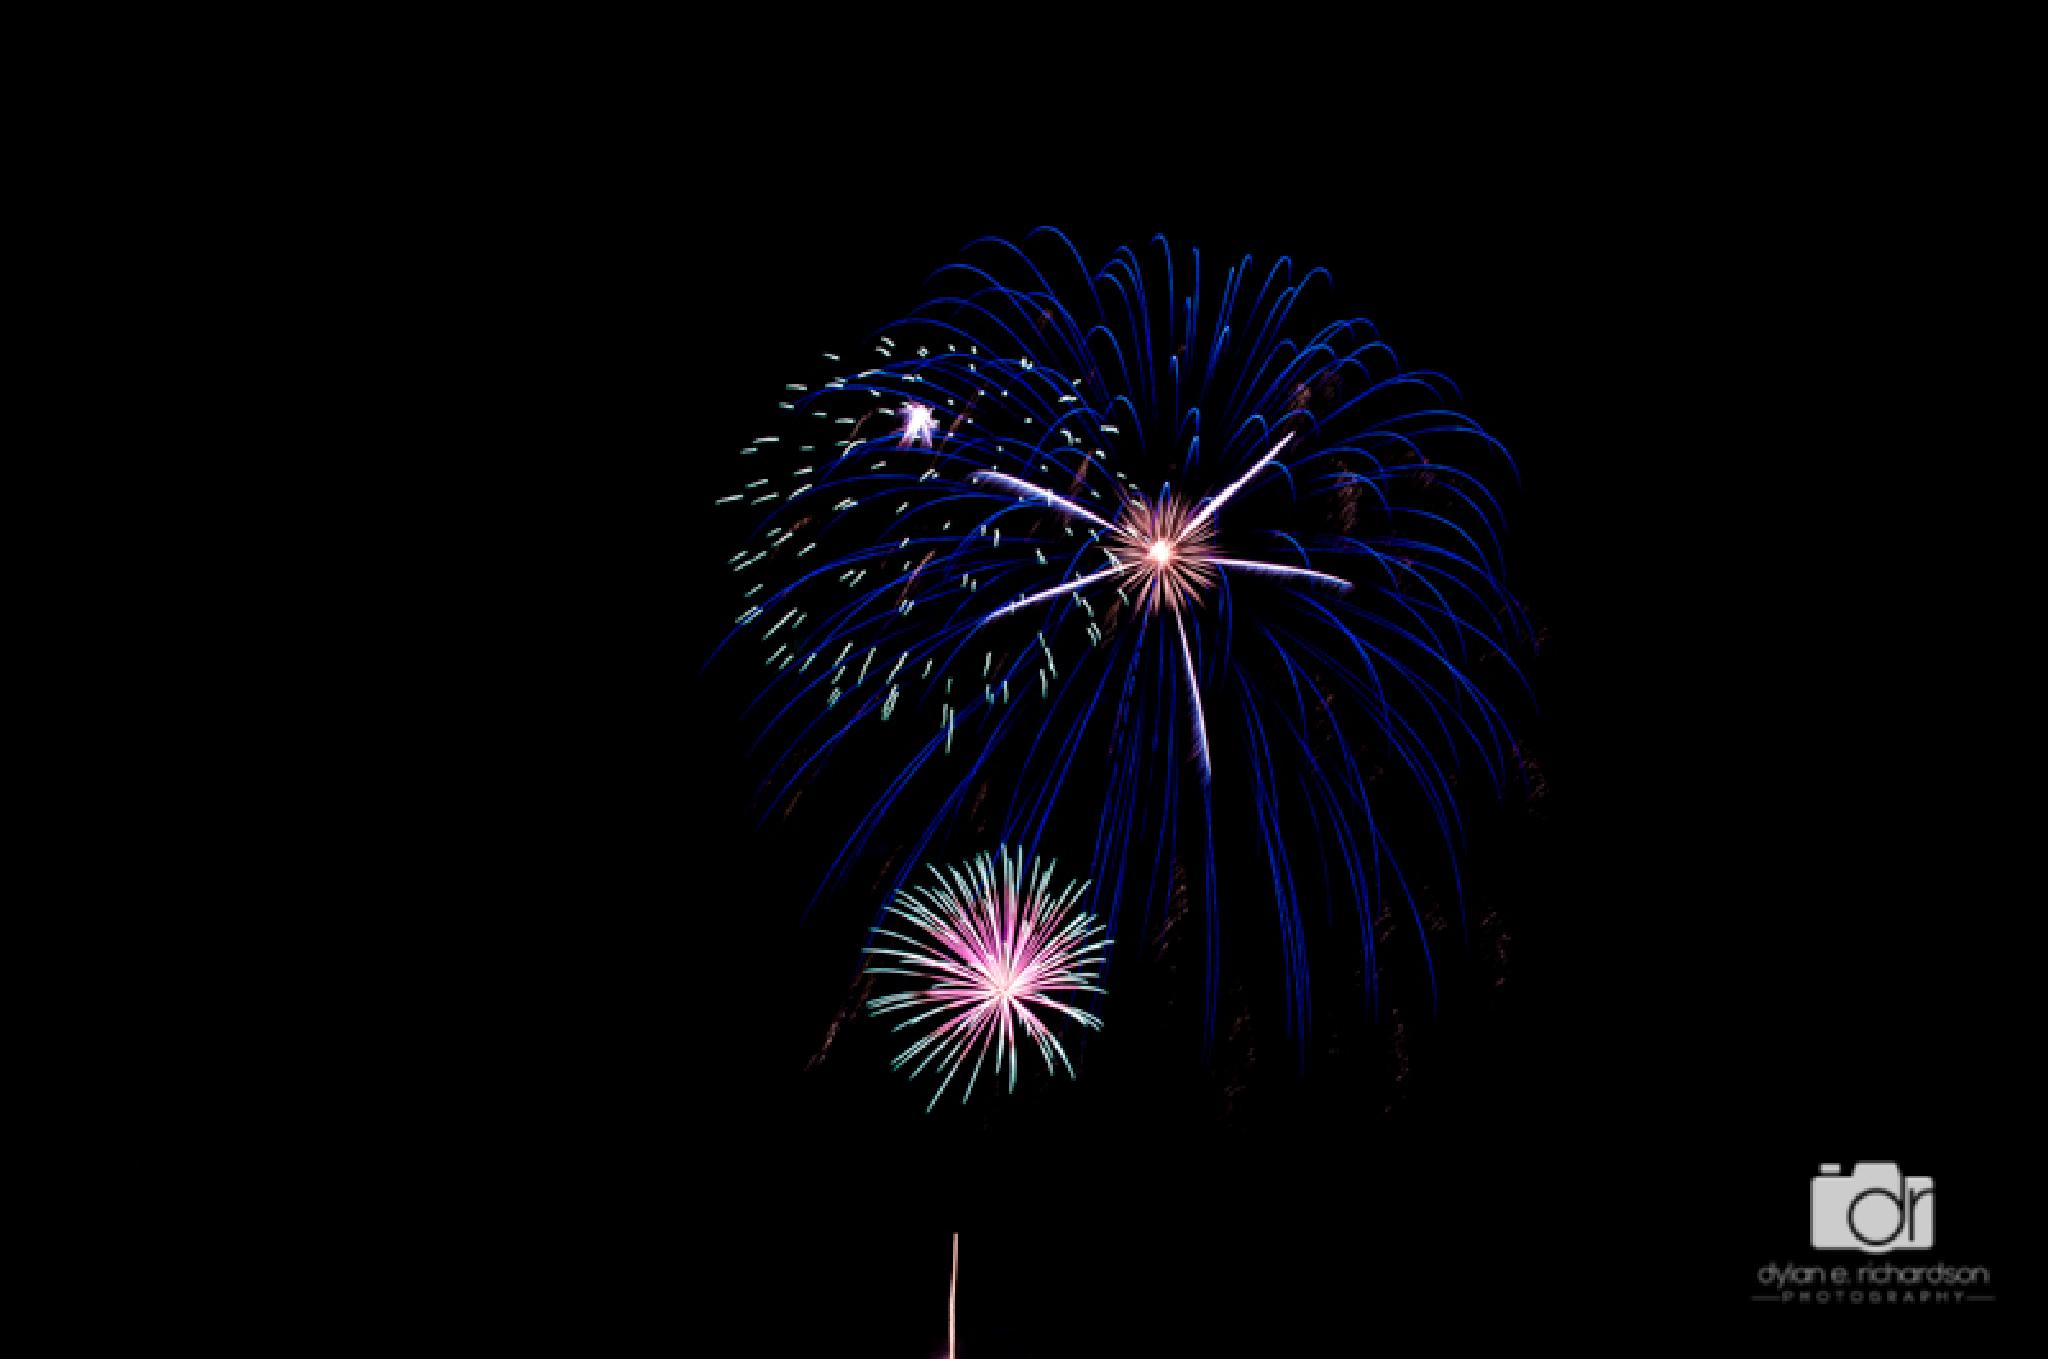 Fireworks 2271 by dronline841